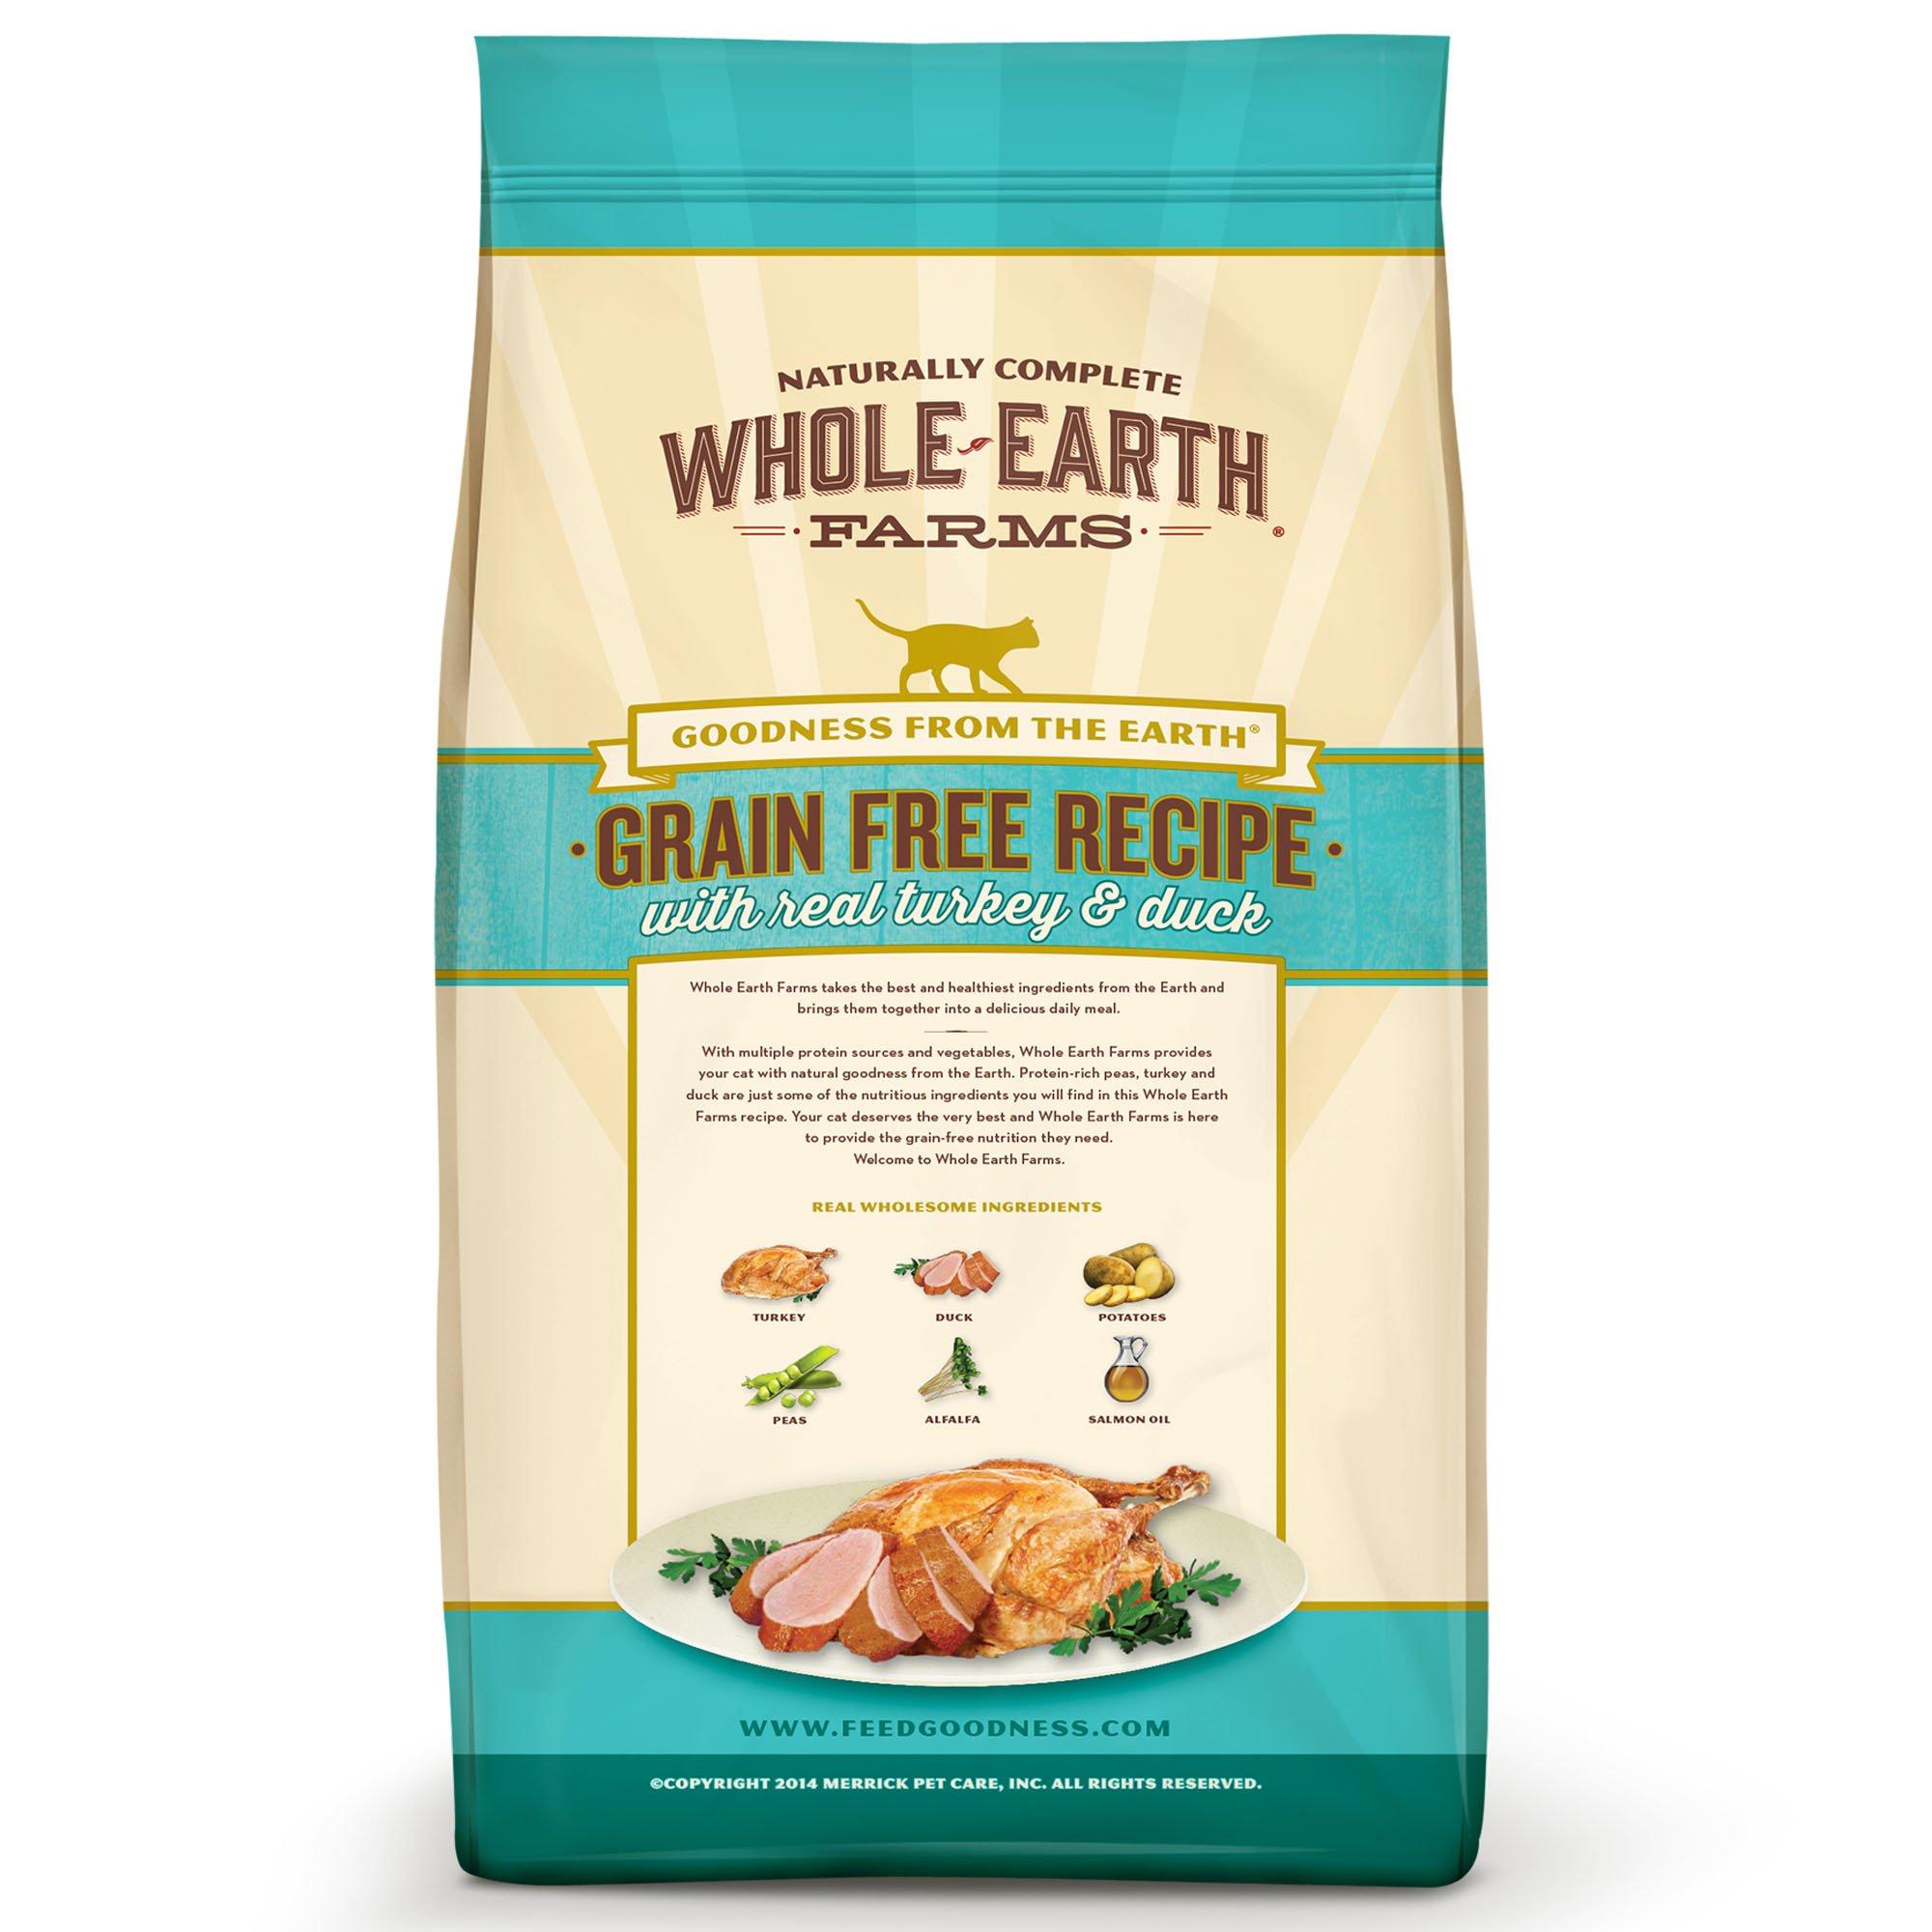 Whole-Earth-Farms-Grain-Free-Real-Turkey-amp-Duck-Cat-Food thumbnail 10